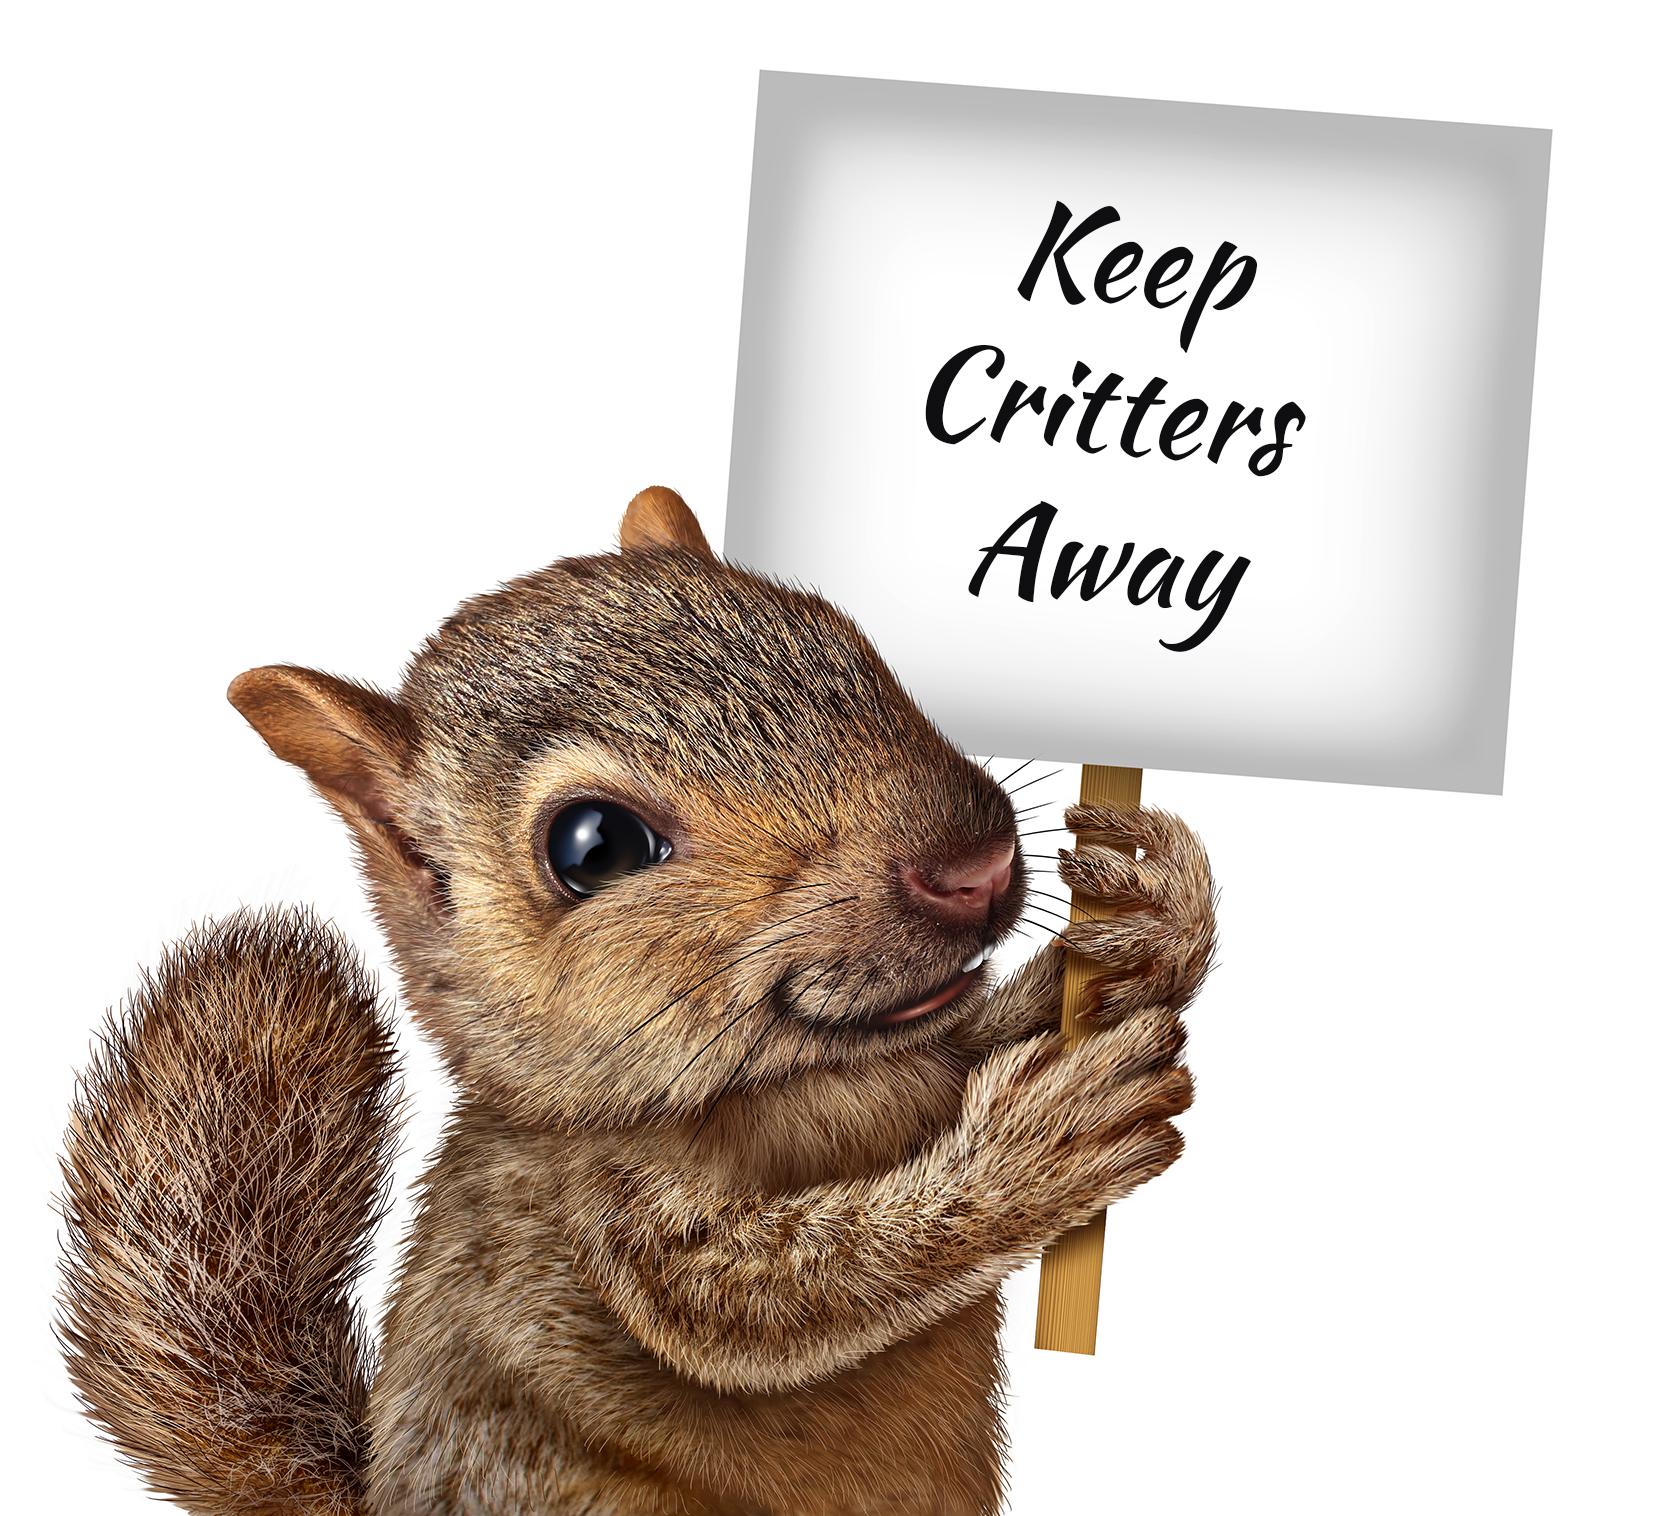 Keep Critters Away